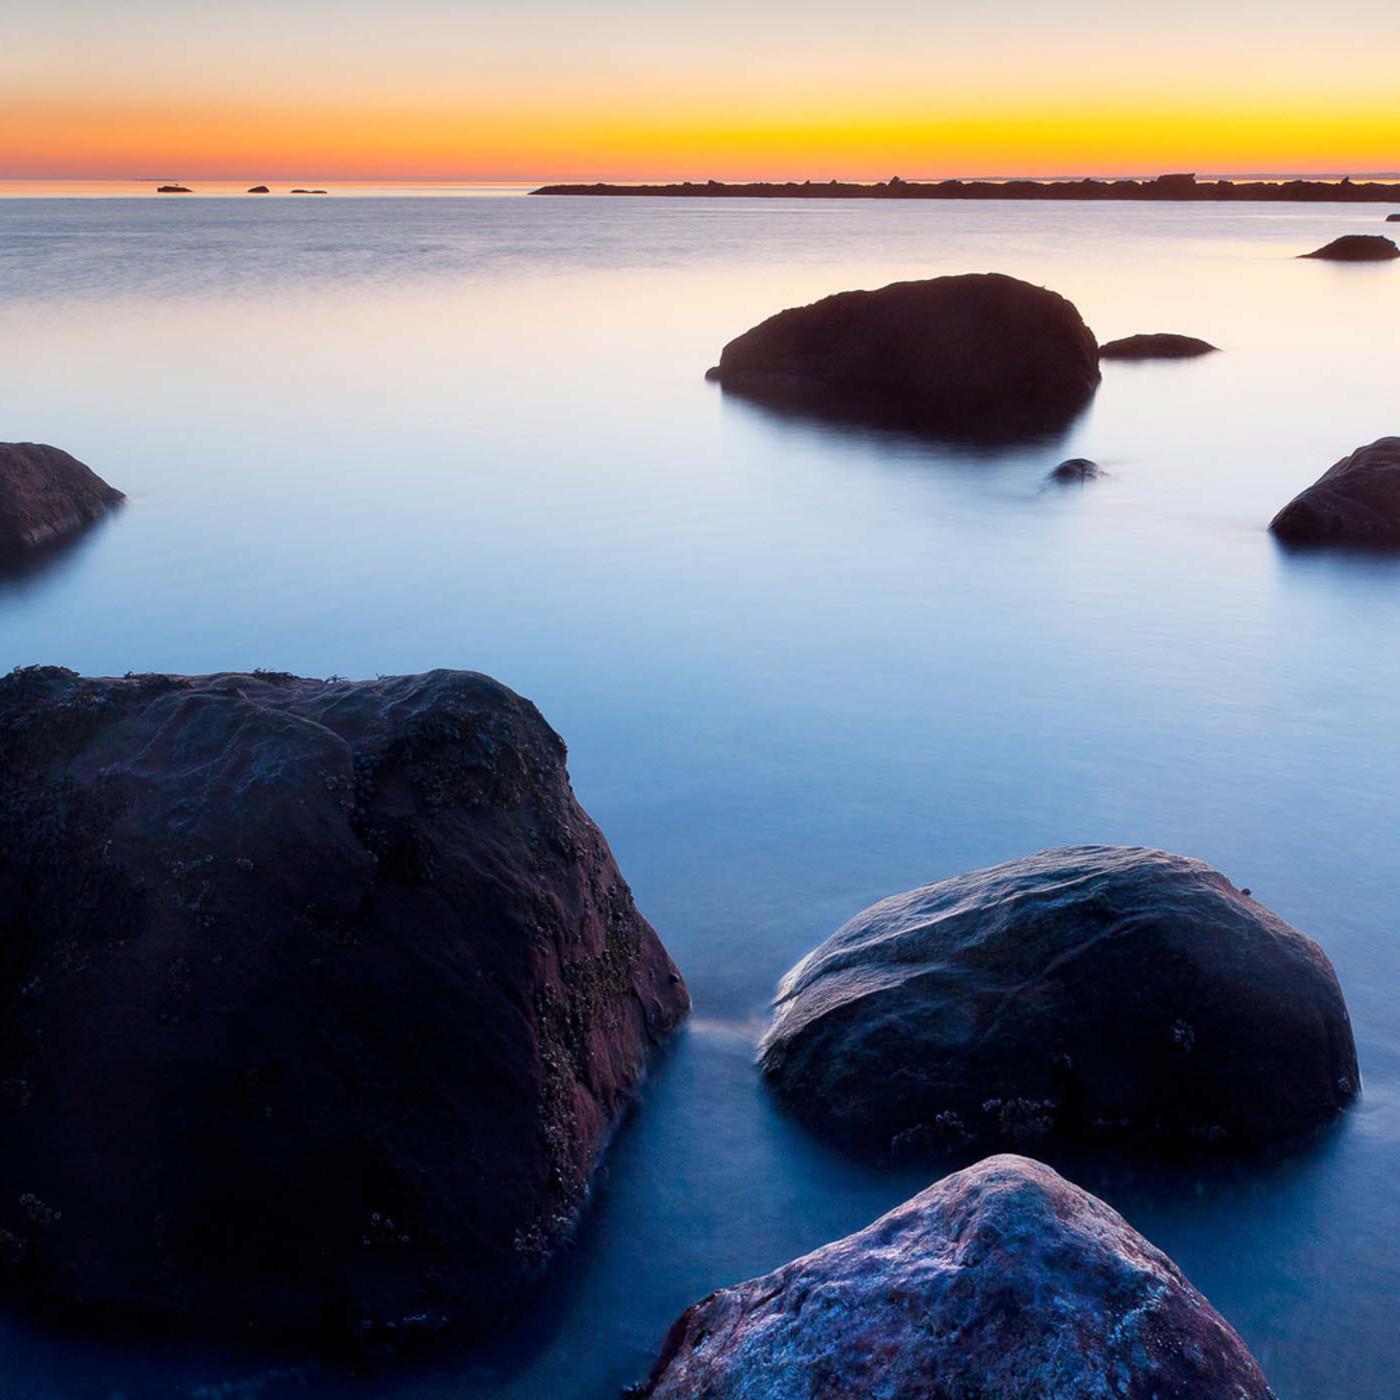 Hamonnasset sunset 9559 stretched 18x27 rtp  sx28tq